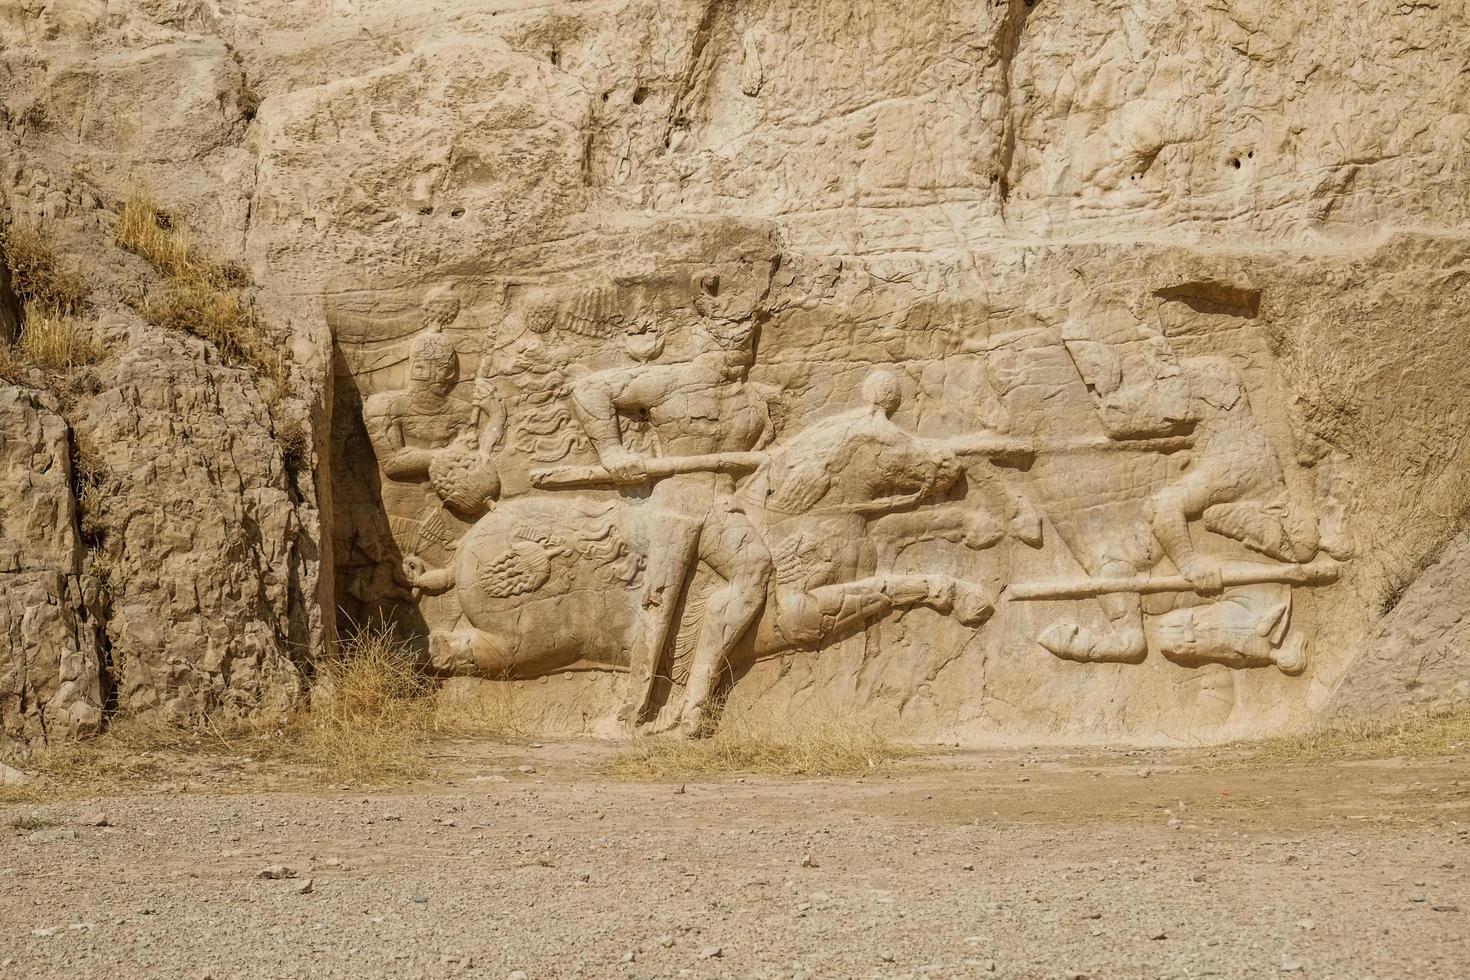 Sassanid rock relief in Naqsh-e Rostam, Iran photo